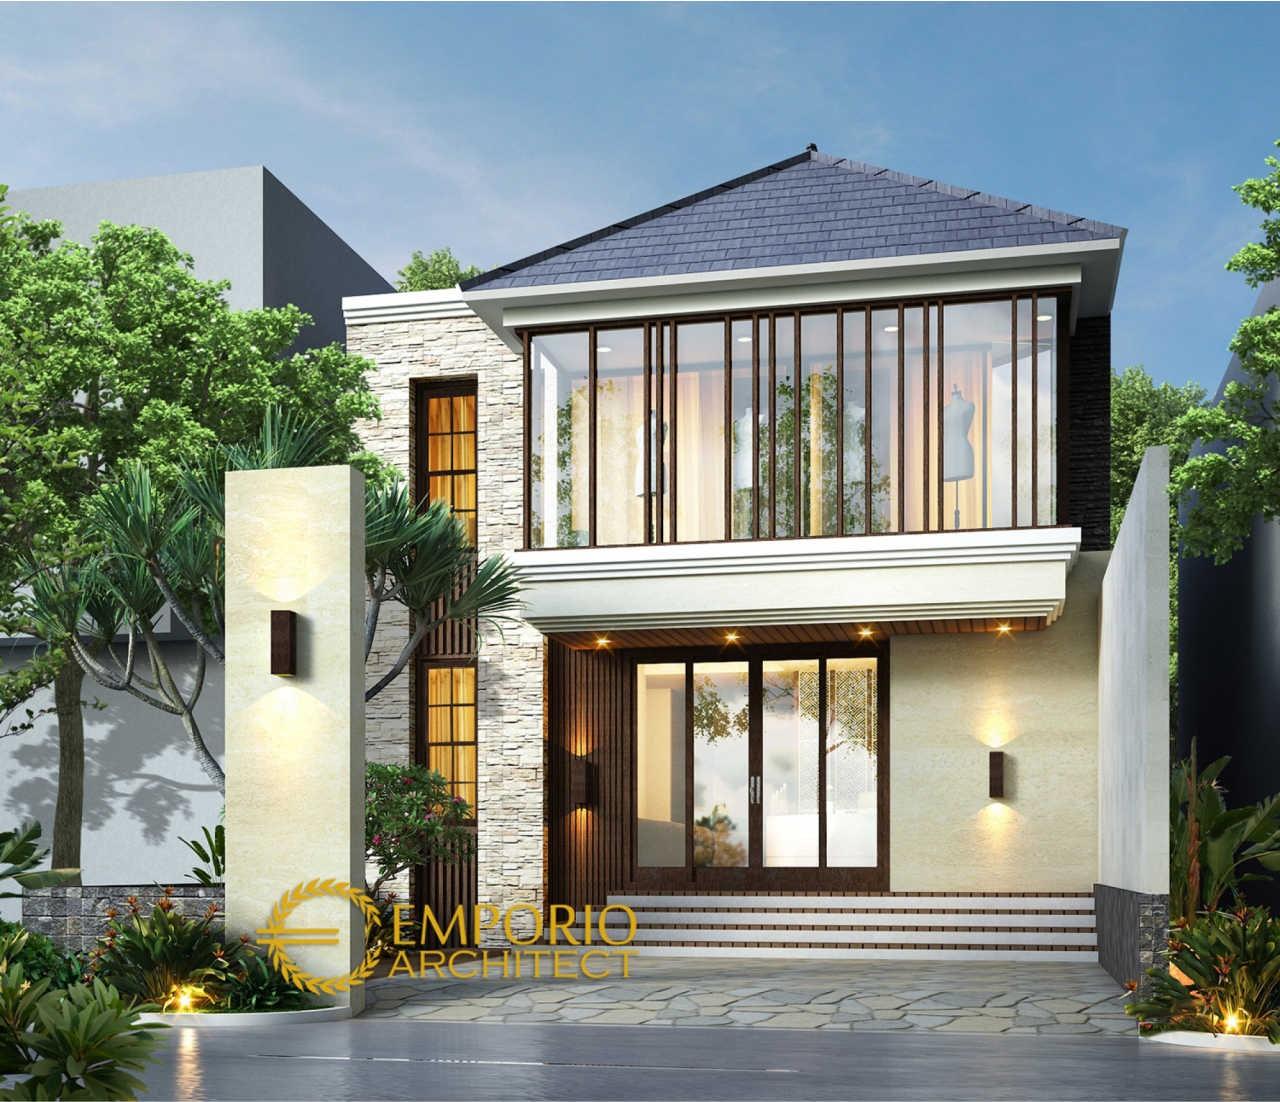 Desain Butik Modern 2 Lantai Ibu Erna di Bandung